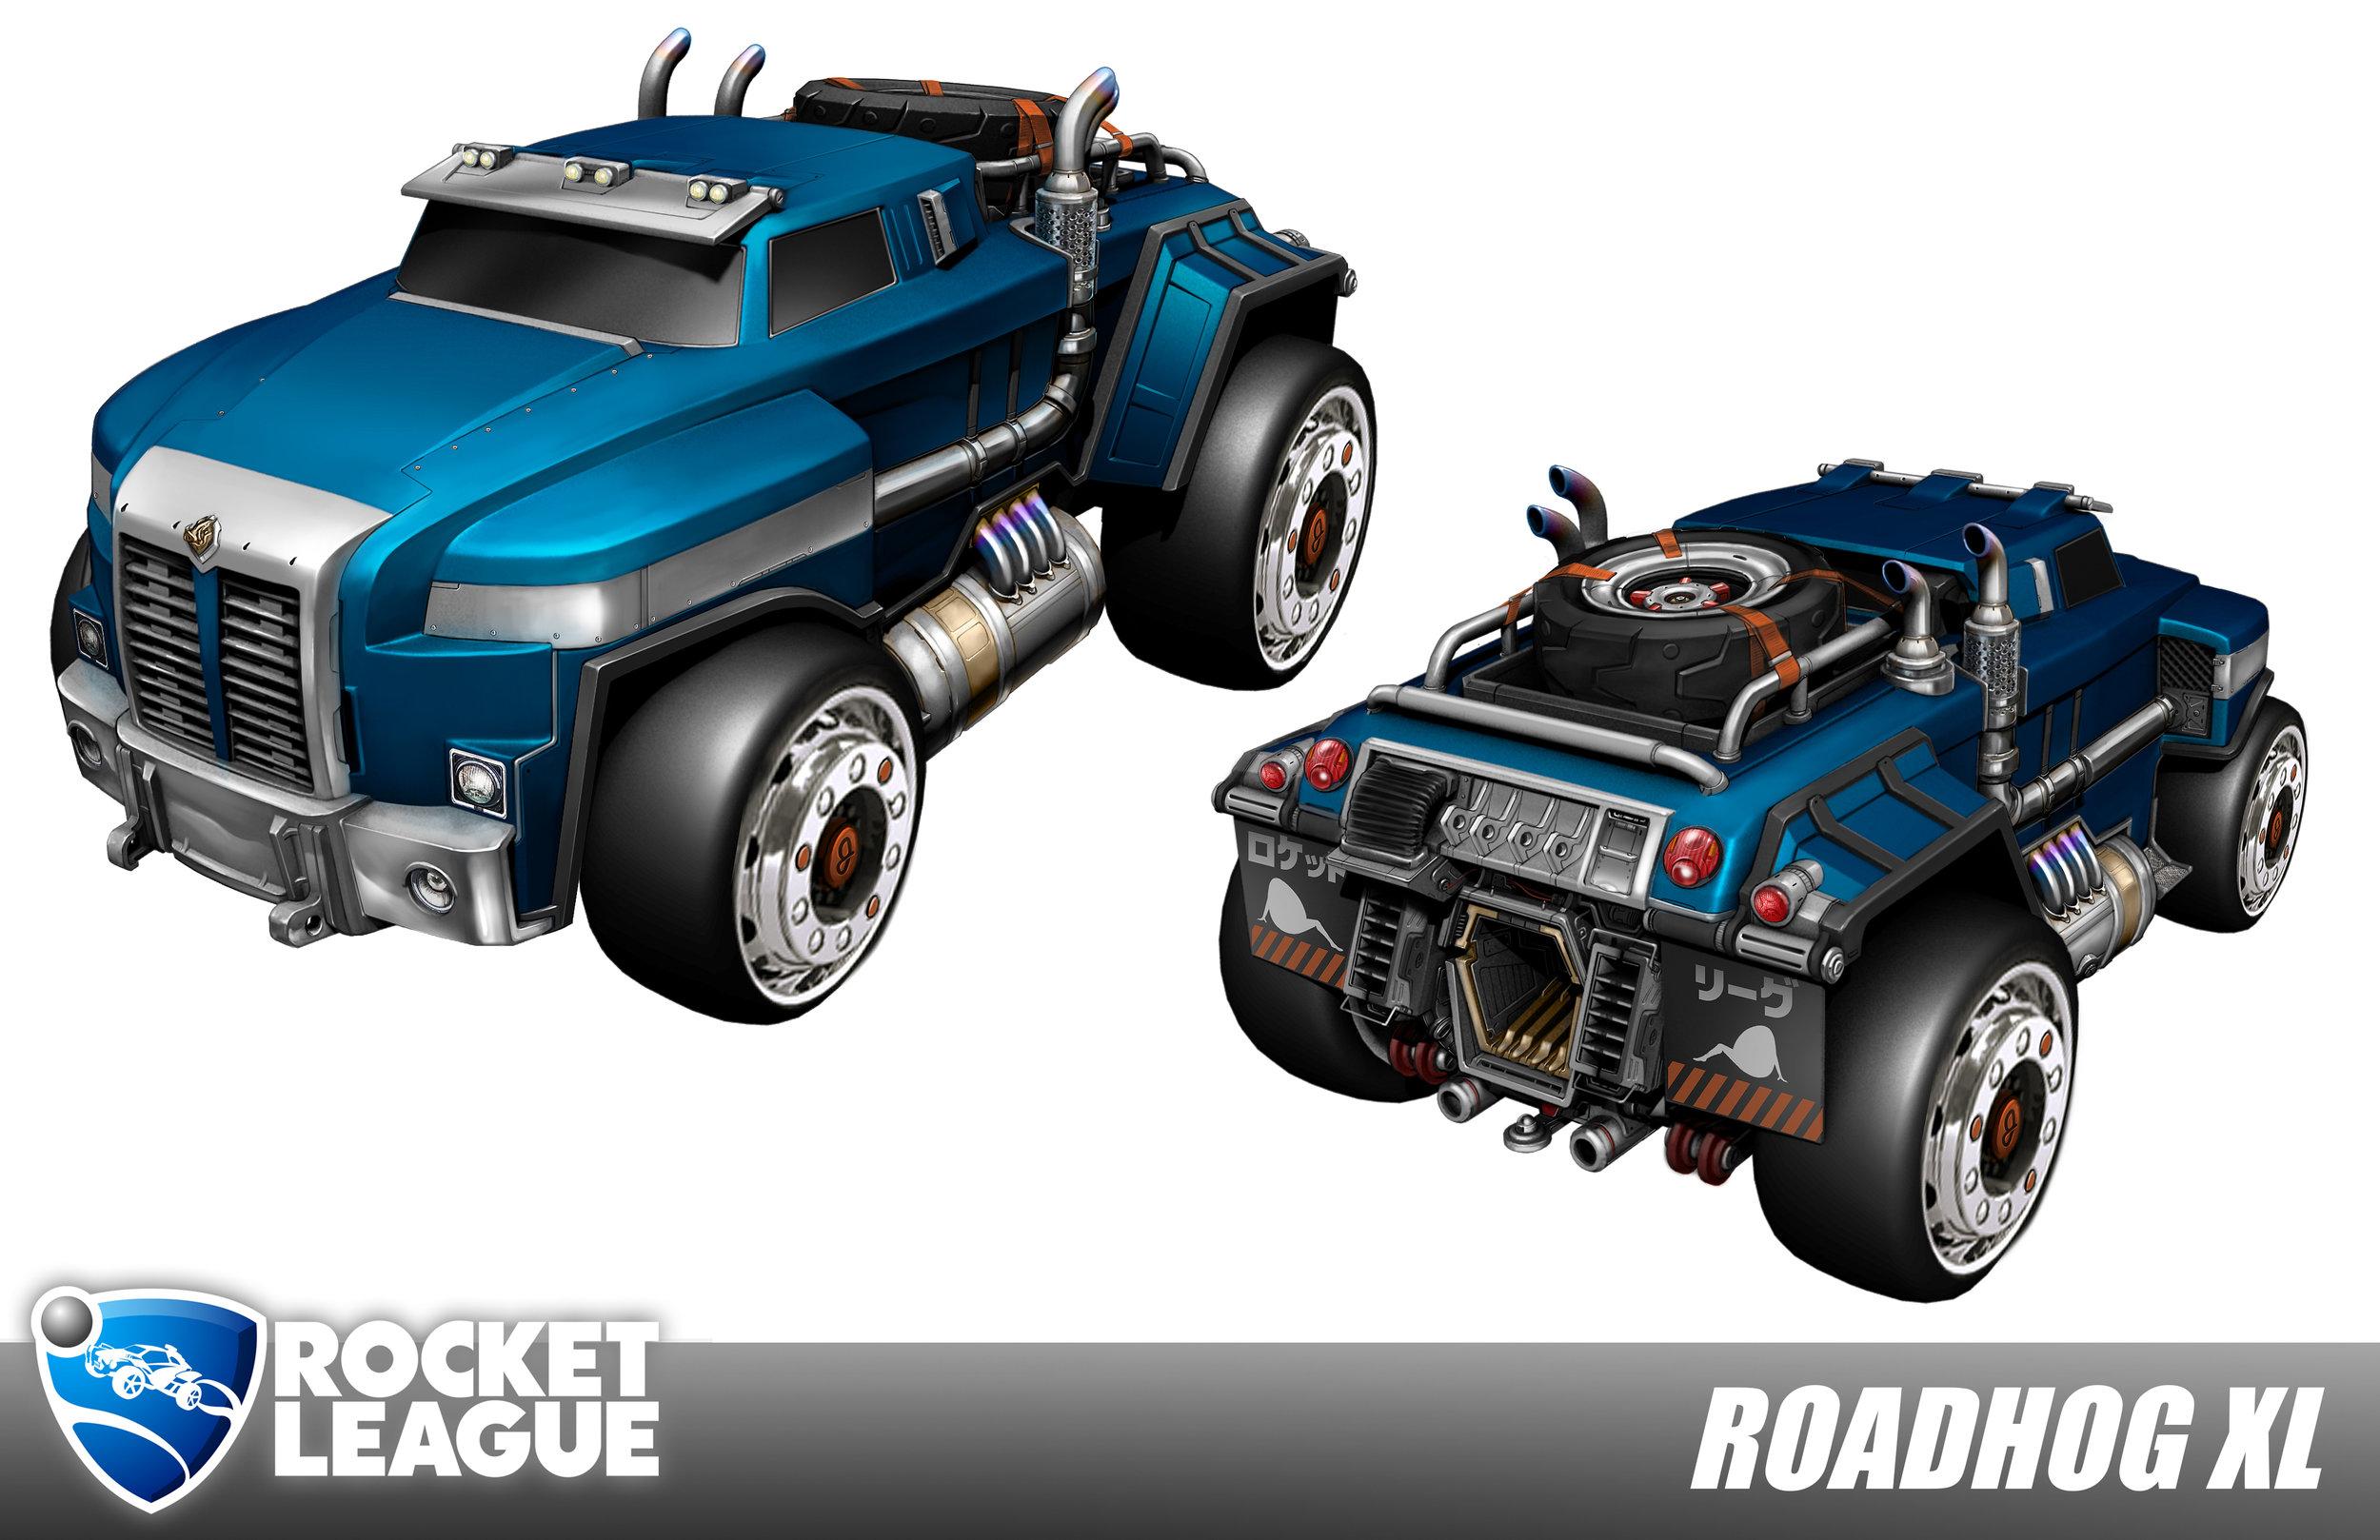 RL_roadhogXL.jpg